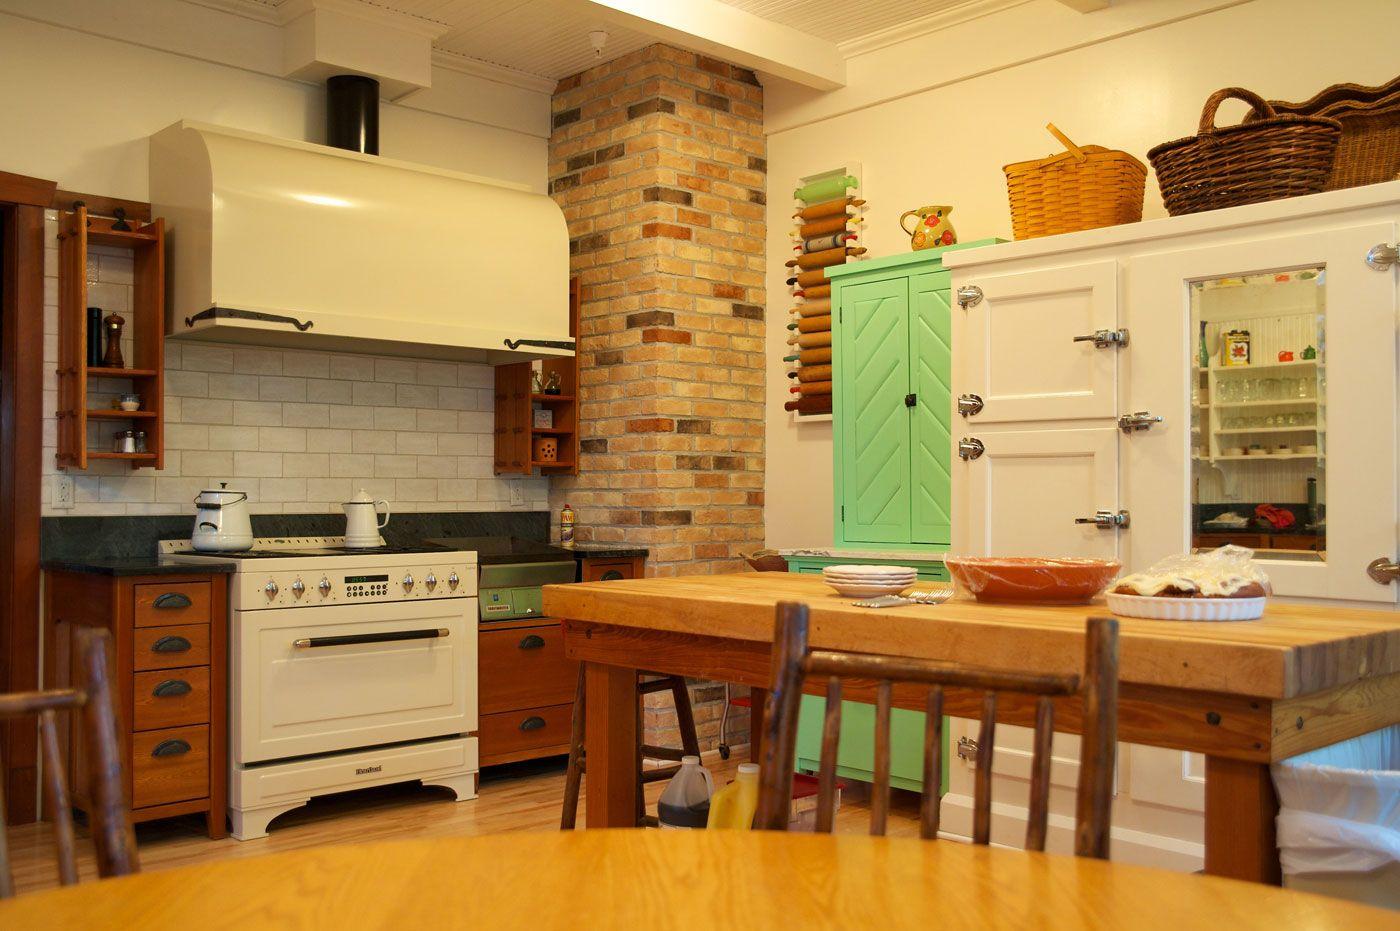 Pin de Thomas Mehl en House in Berlin - Kitchen | Pinterest